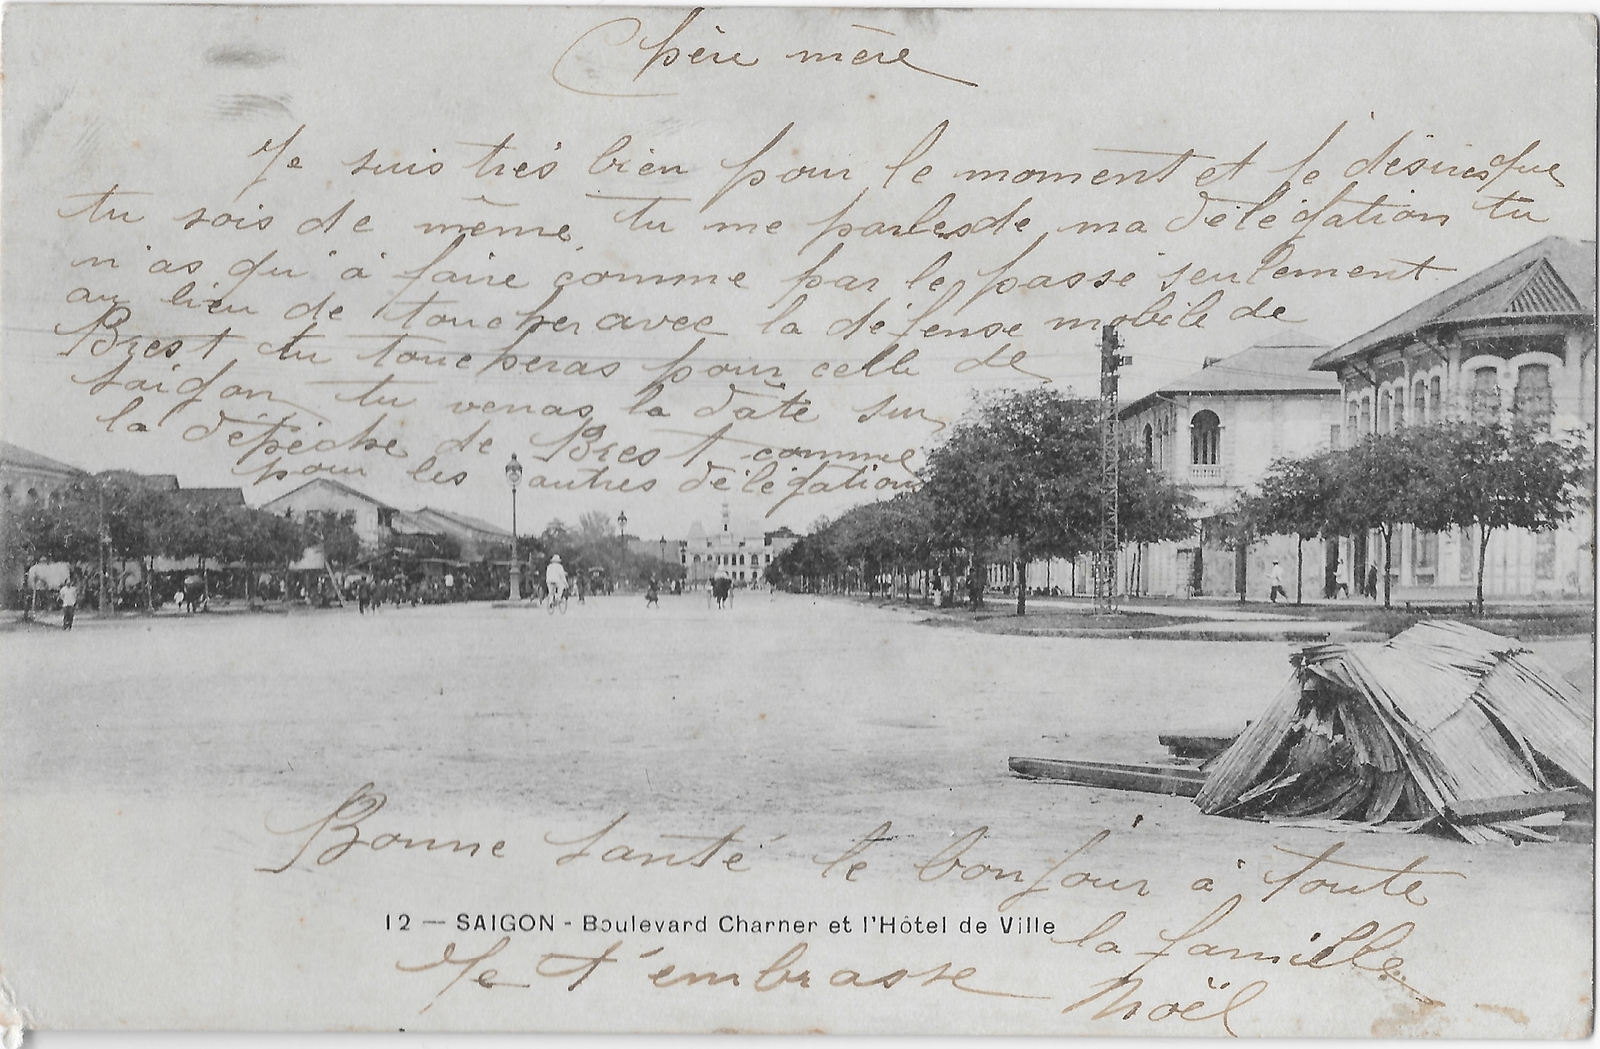 Saïgon -  Boulevard Charner et Hôtel de Ville